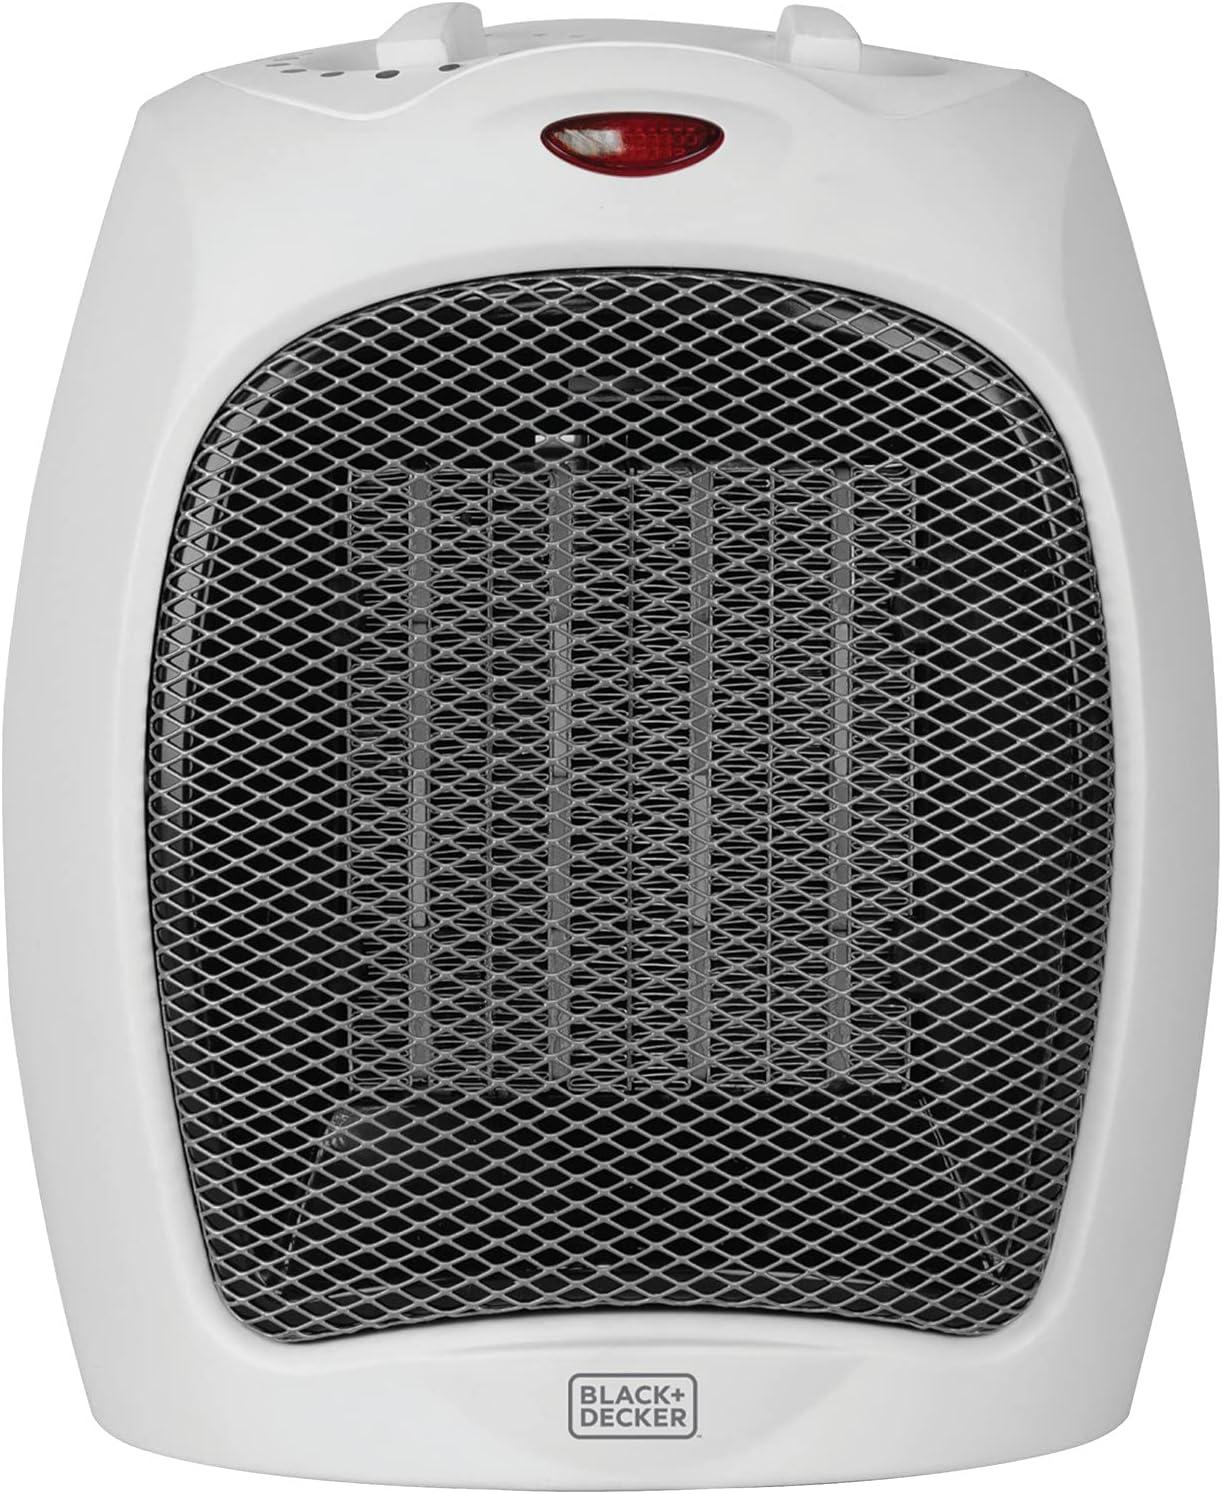 BLACK+DECKER Desktop Ceramic Space Heater $11.97 Coupon